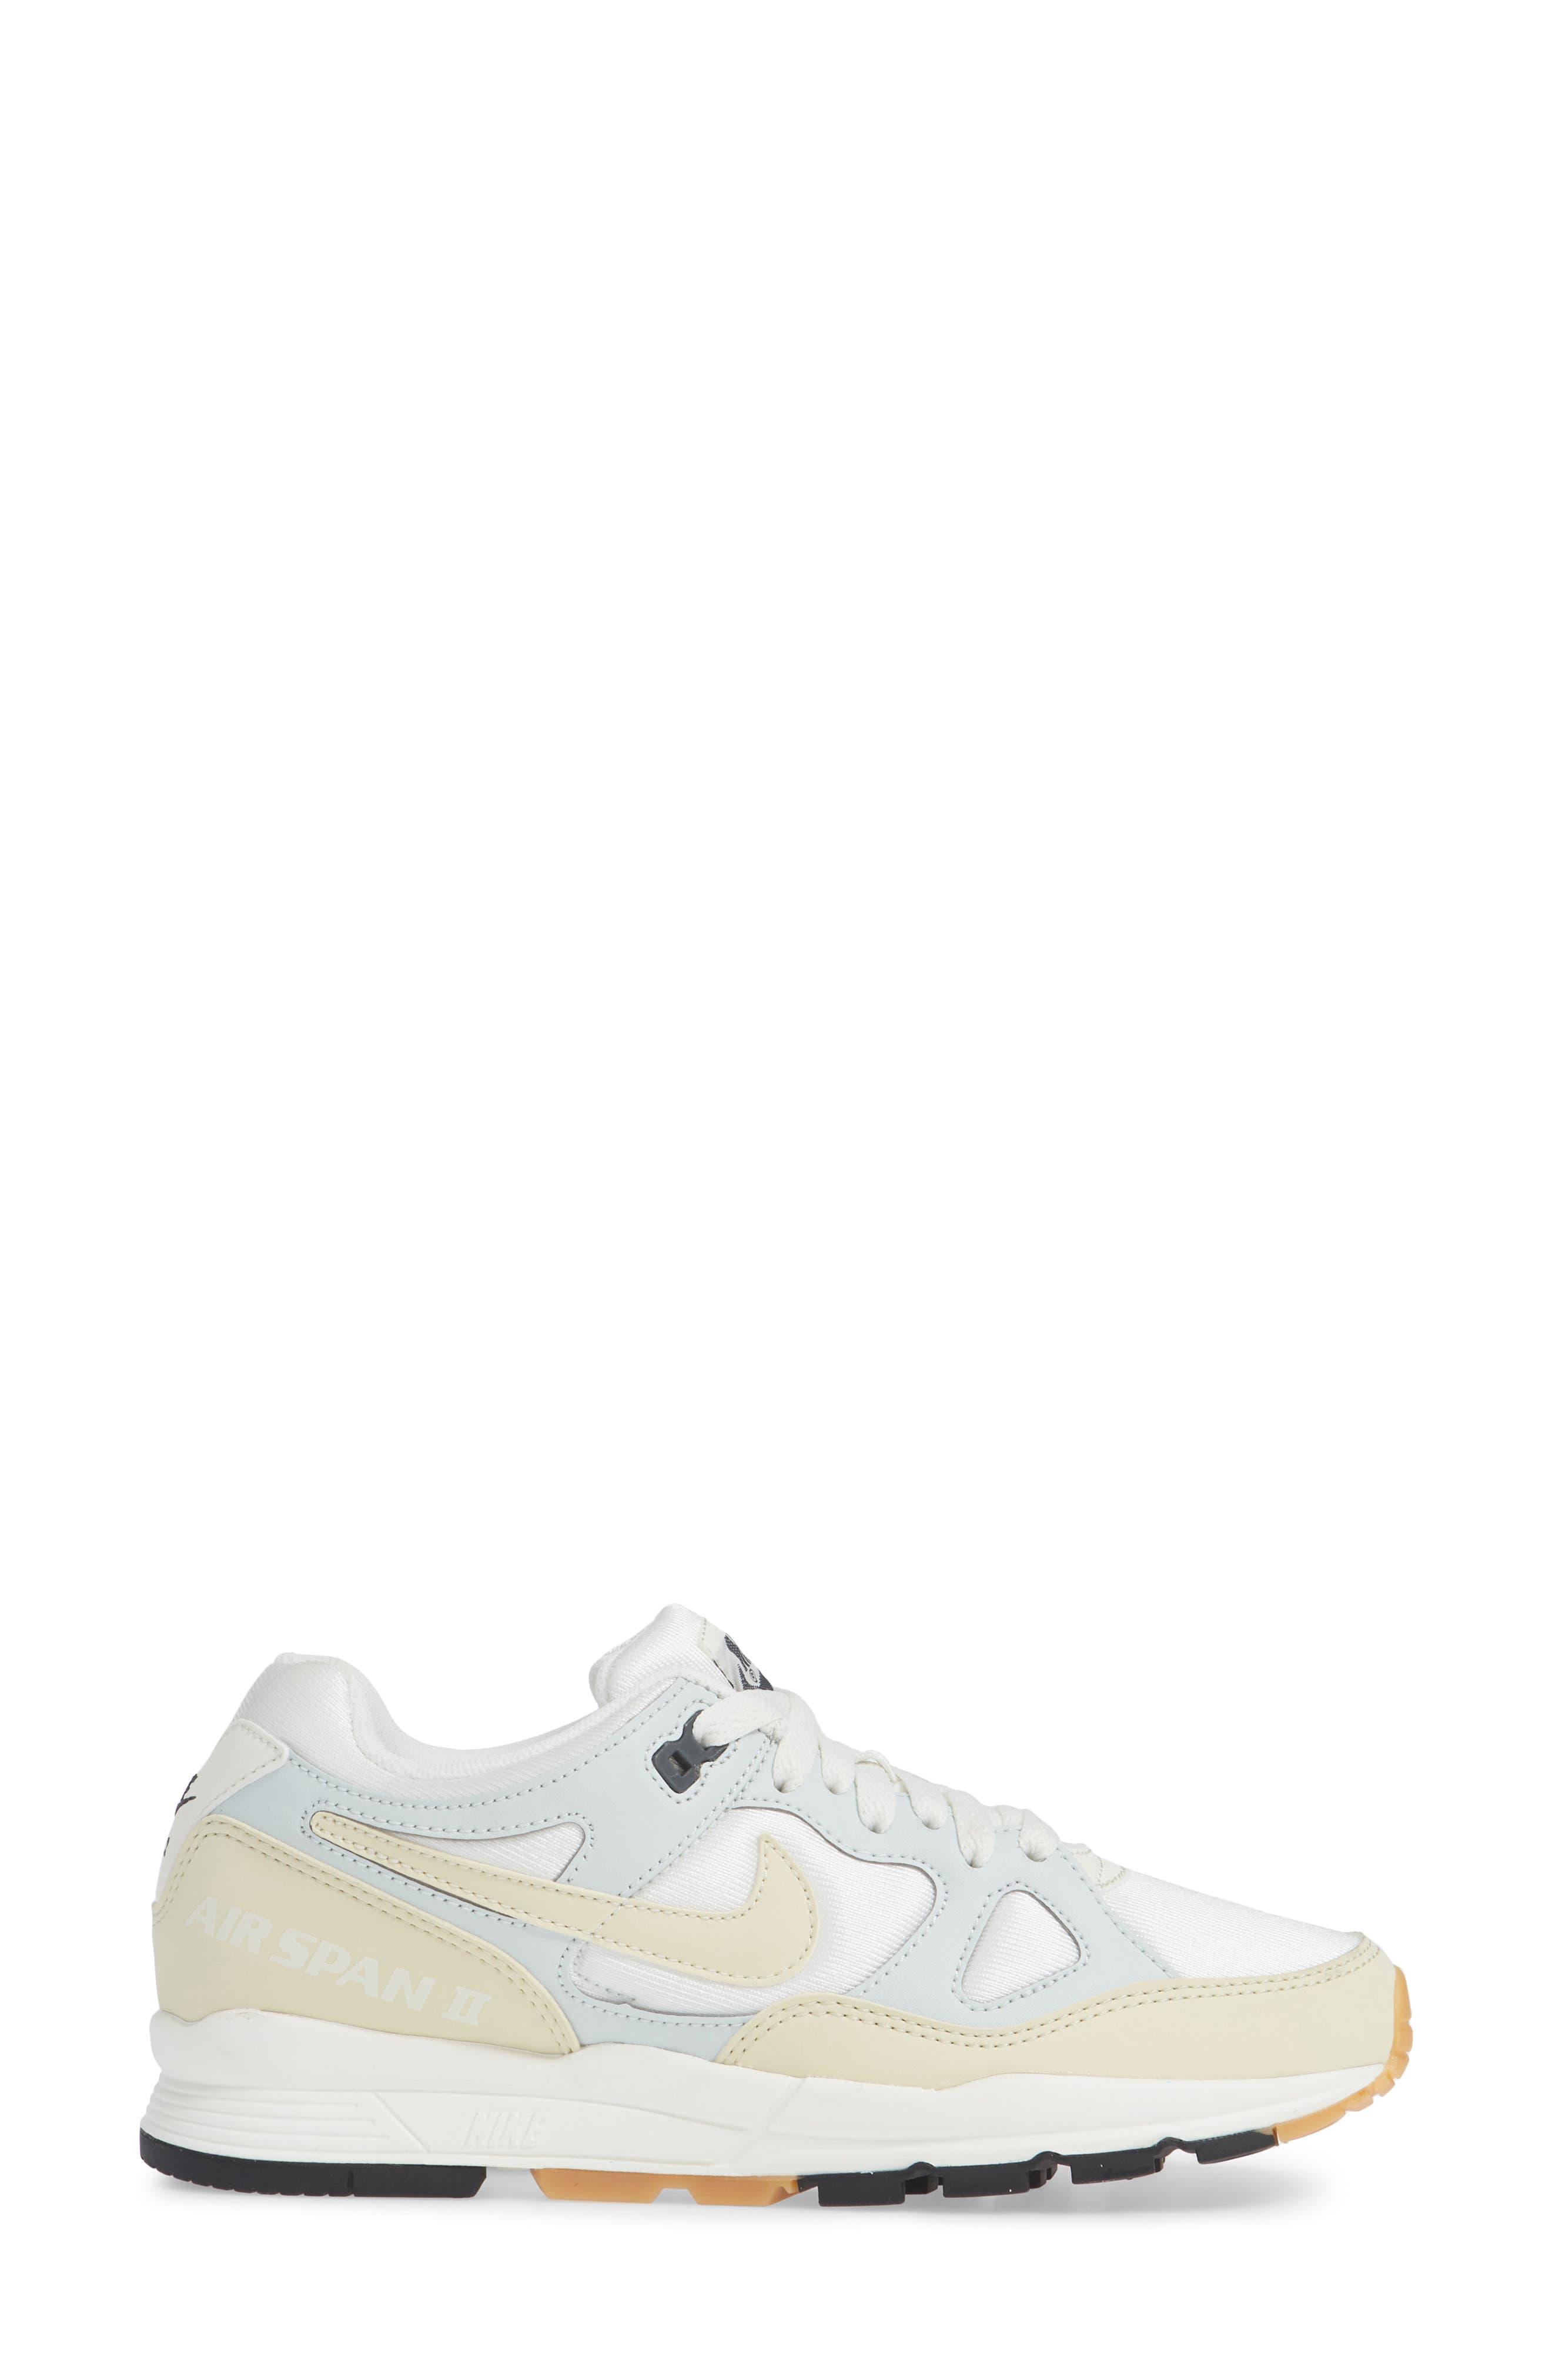 Air Span II Sneaker,                             Alternate thumbnail 3, color,                             Sail/ Fossil-Barely Grey-Black